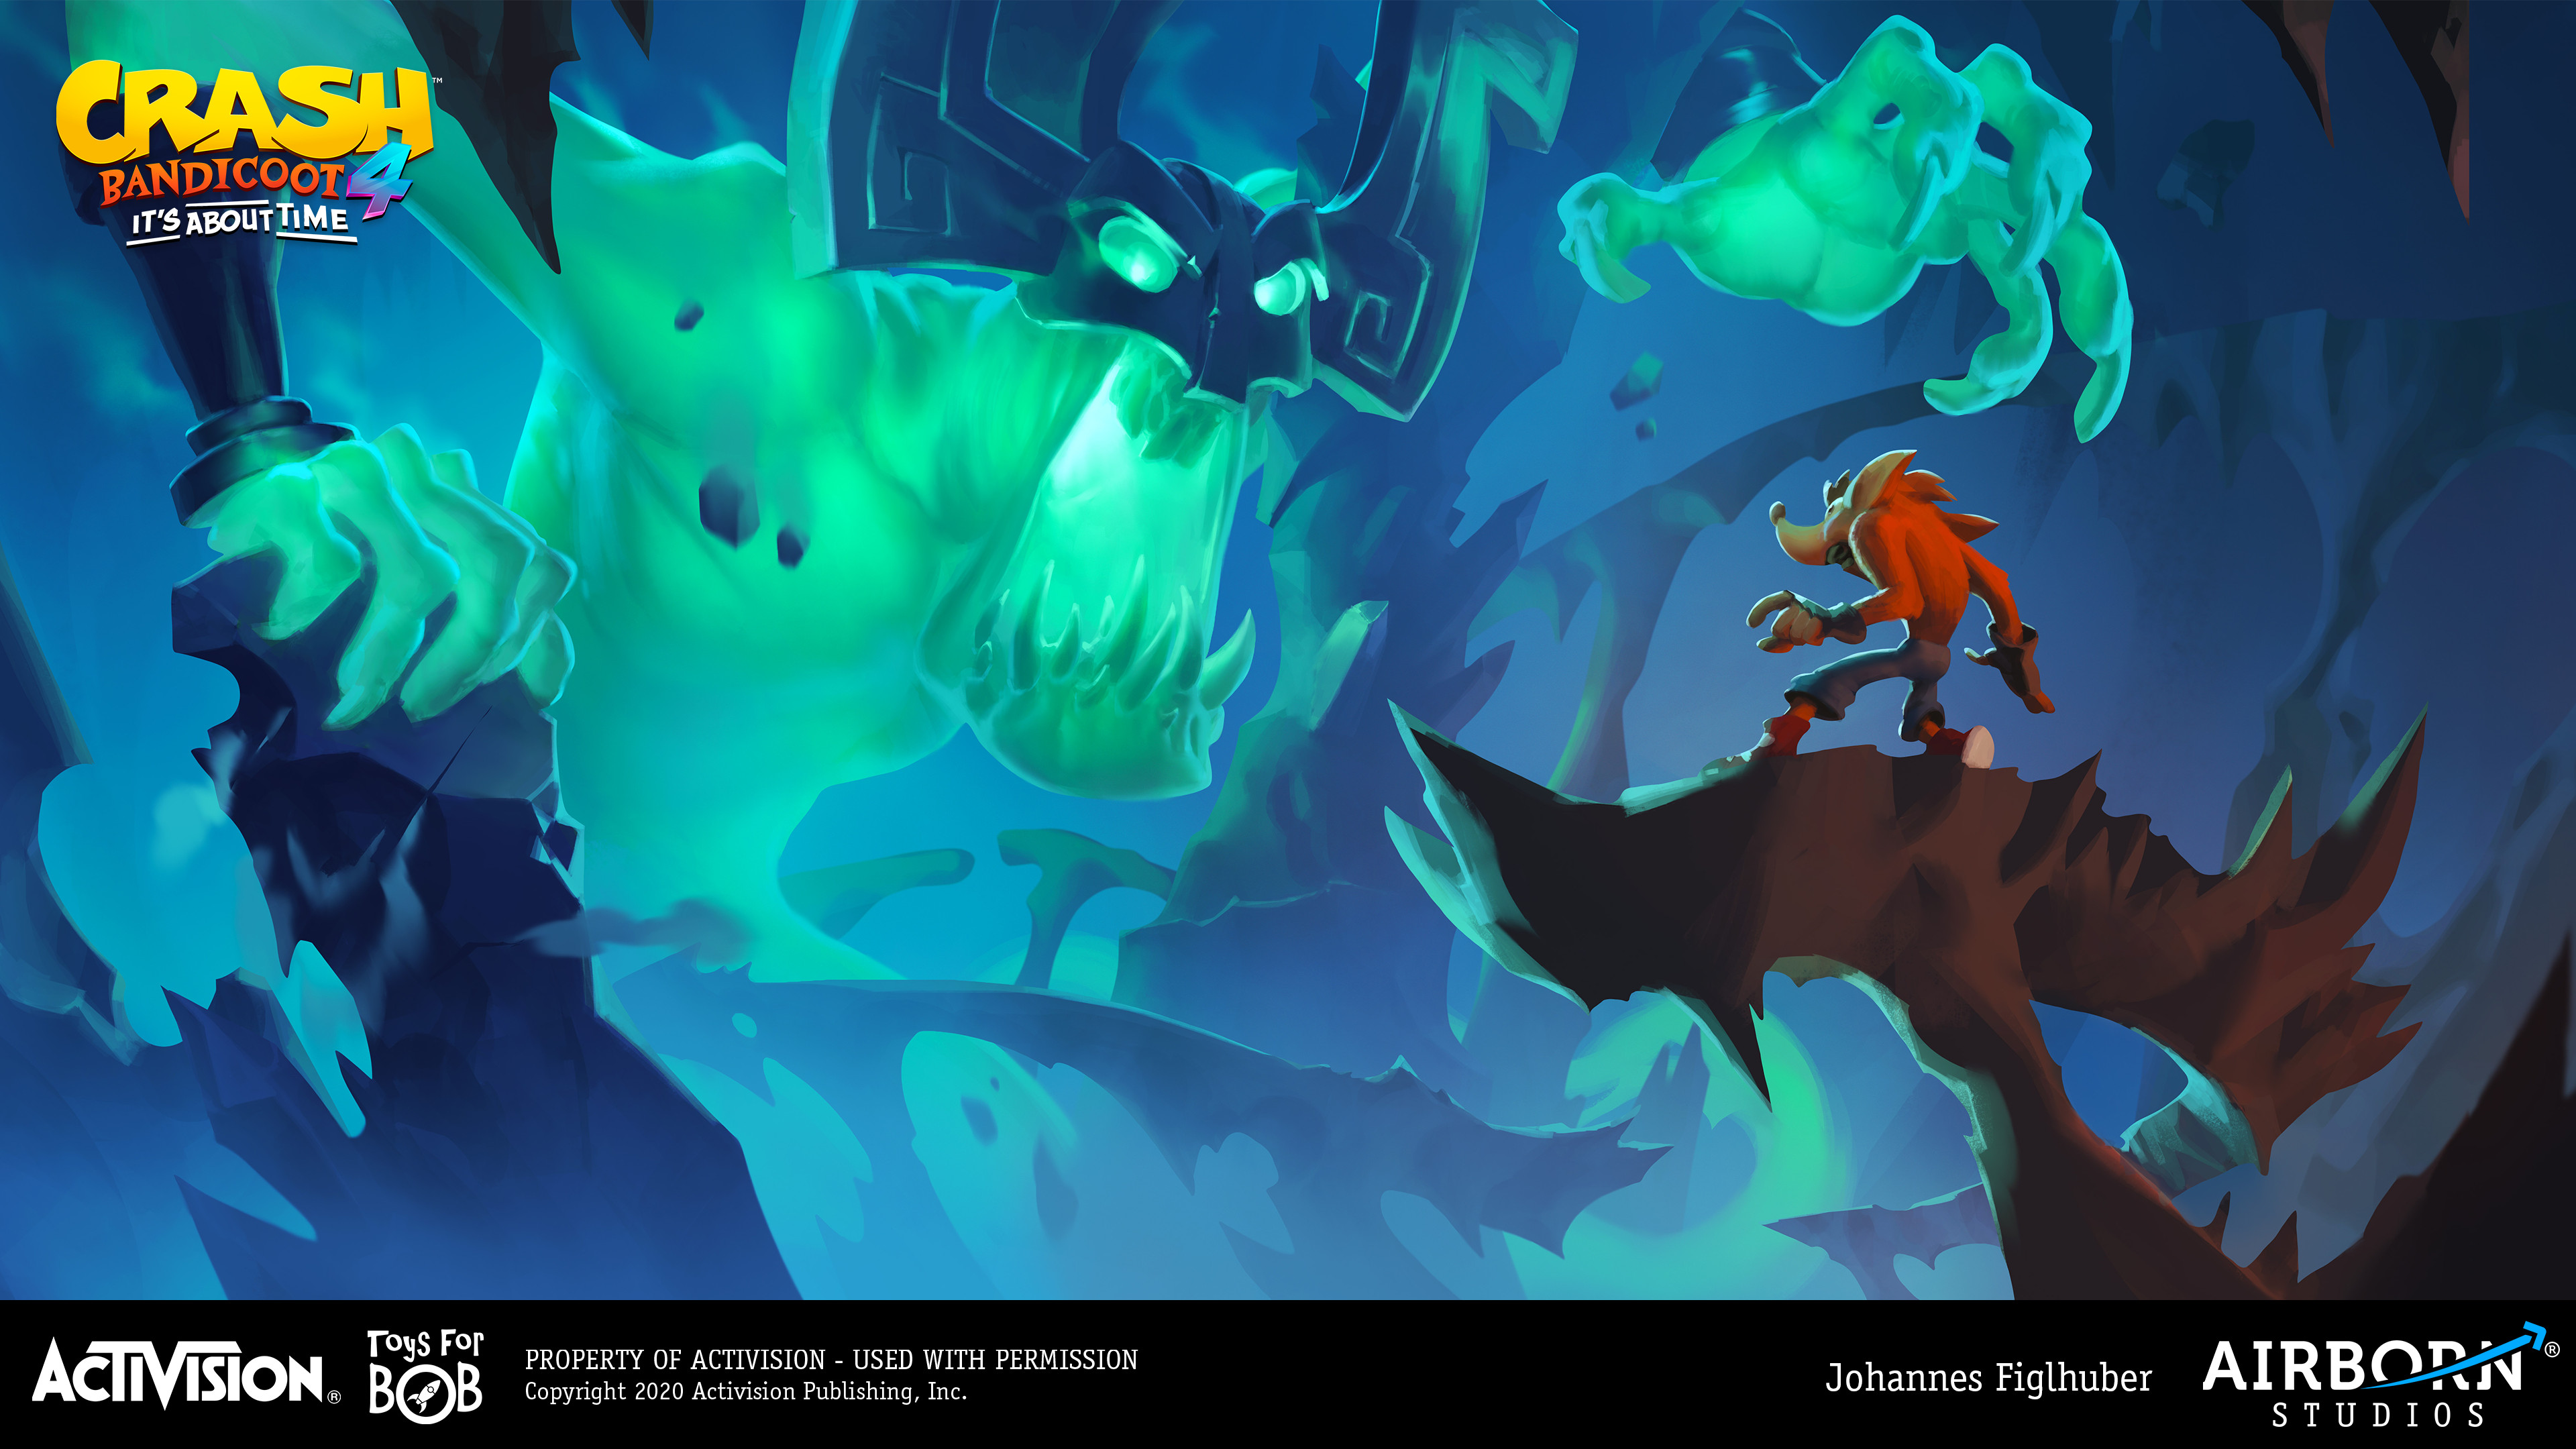 Spirit Encounter ((vis-dev key artwork, co-credit to Nicola Saviori)